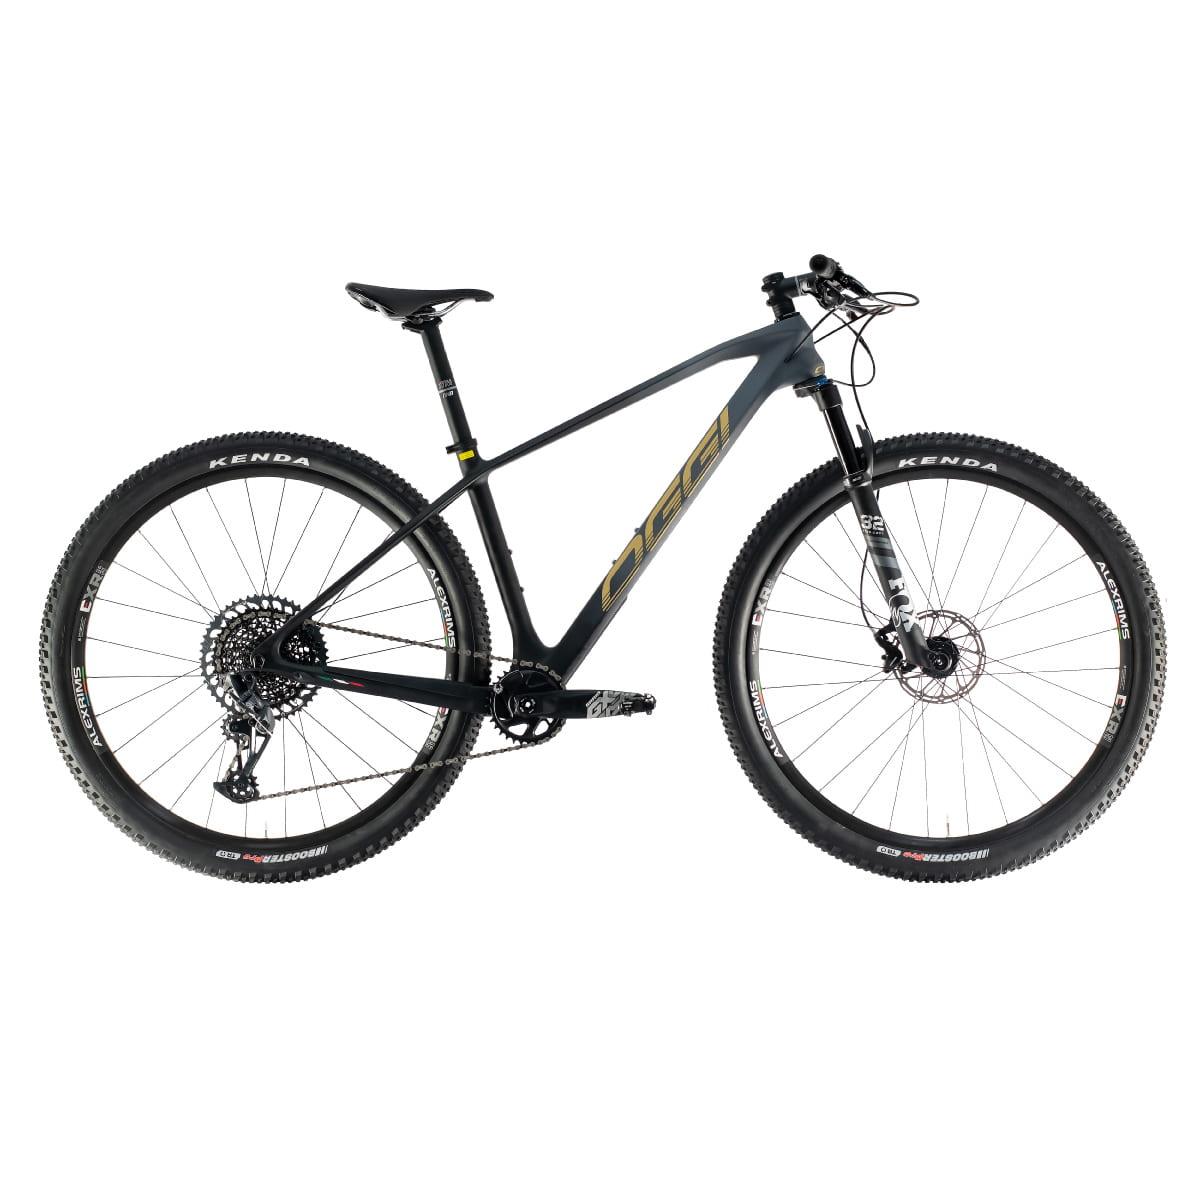 Bike Oggi Agile Pro 2021 Carbono Sram GX Preto Dourado